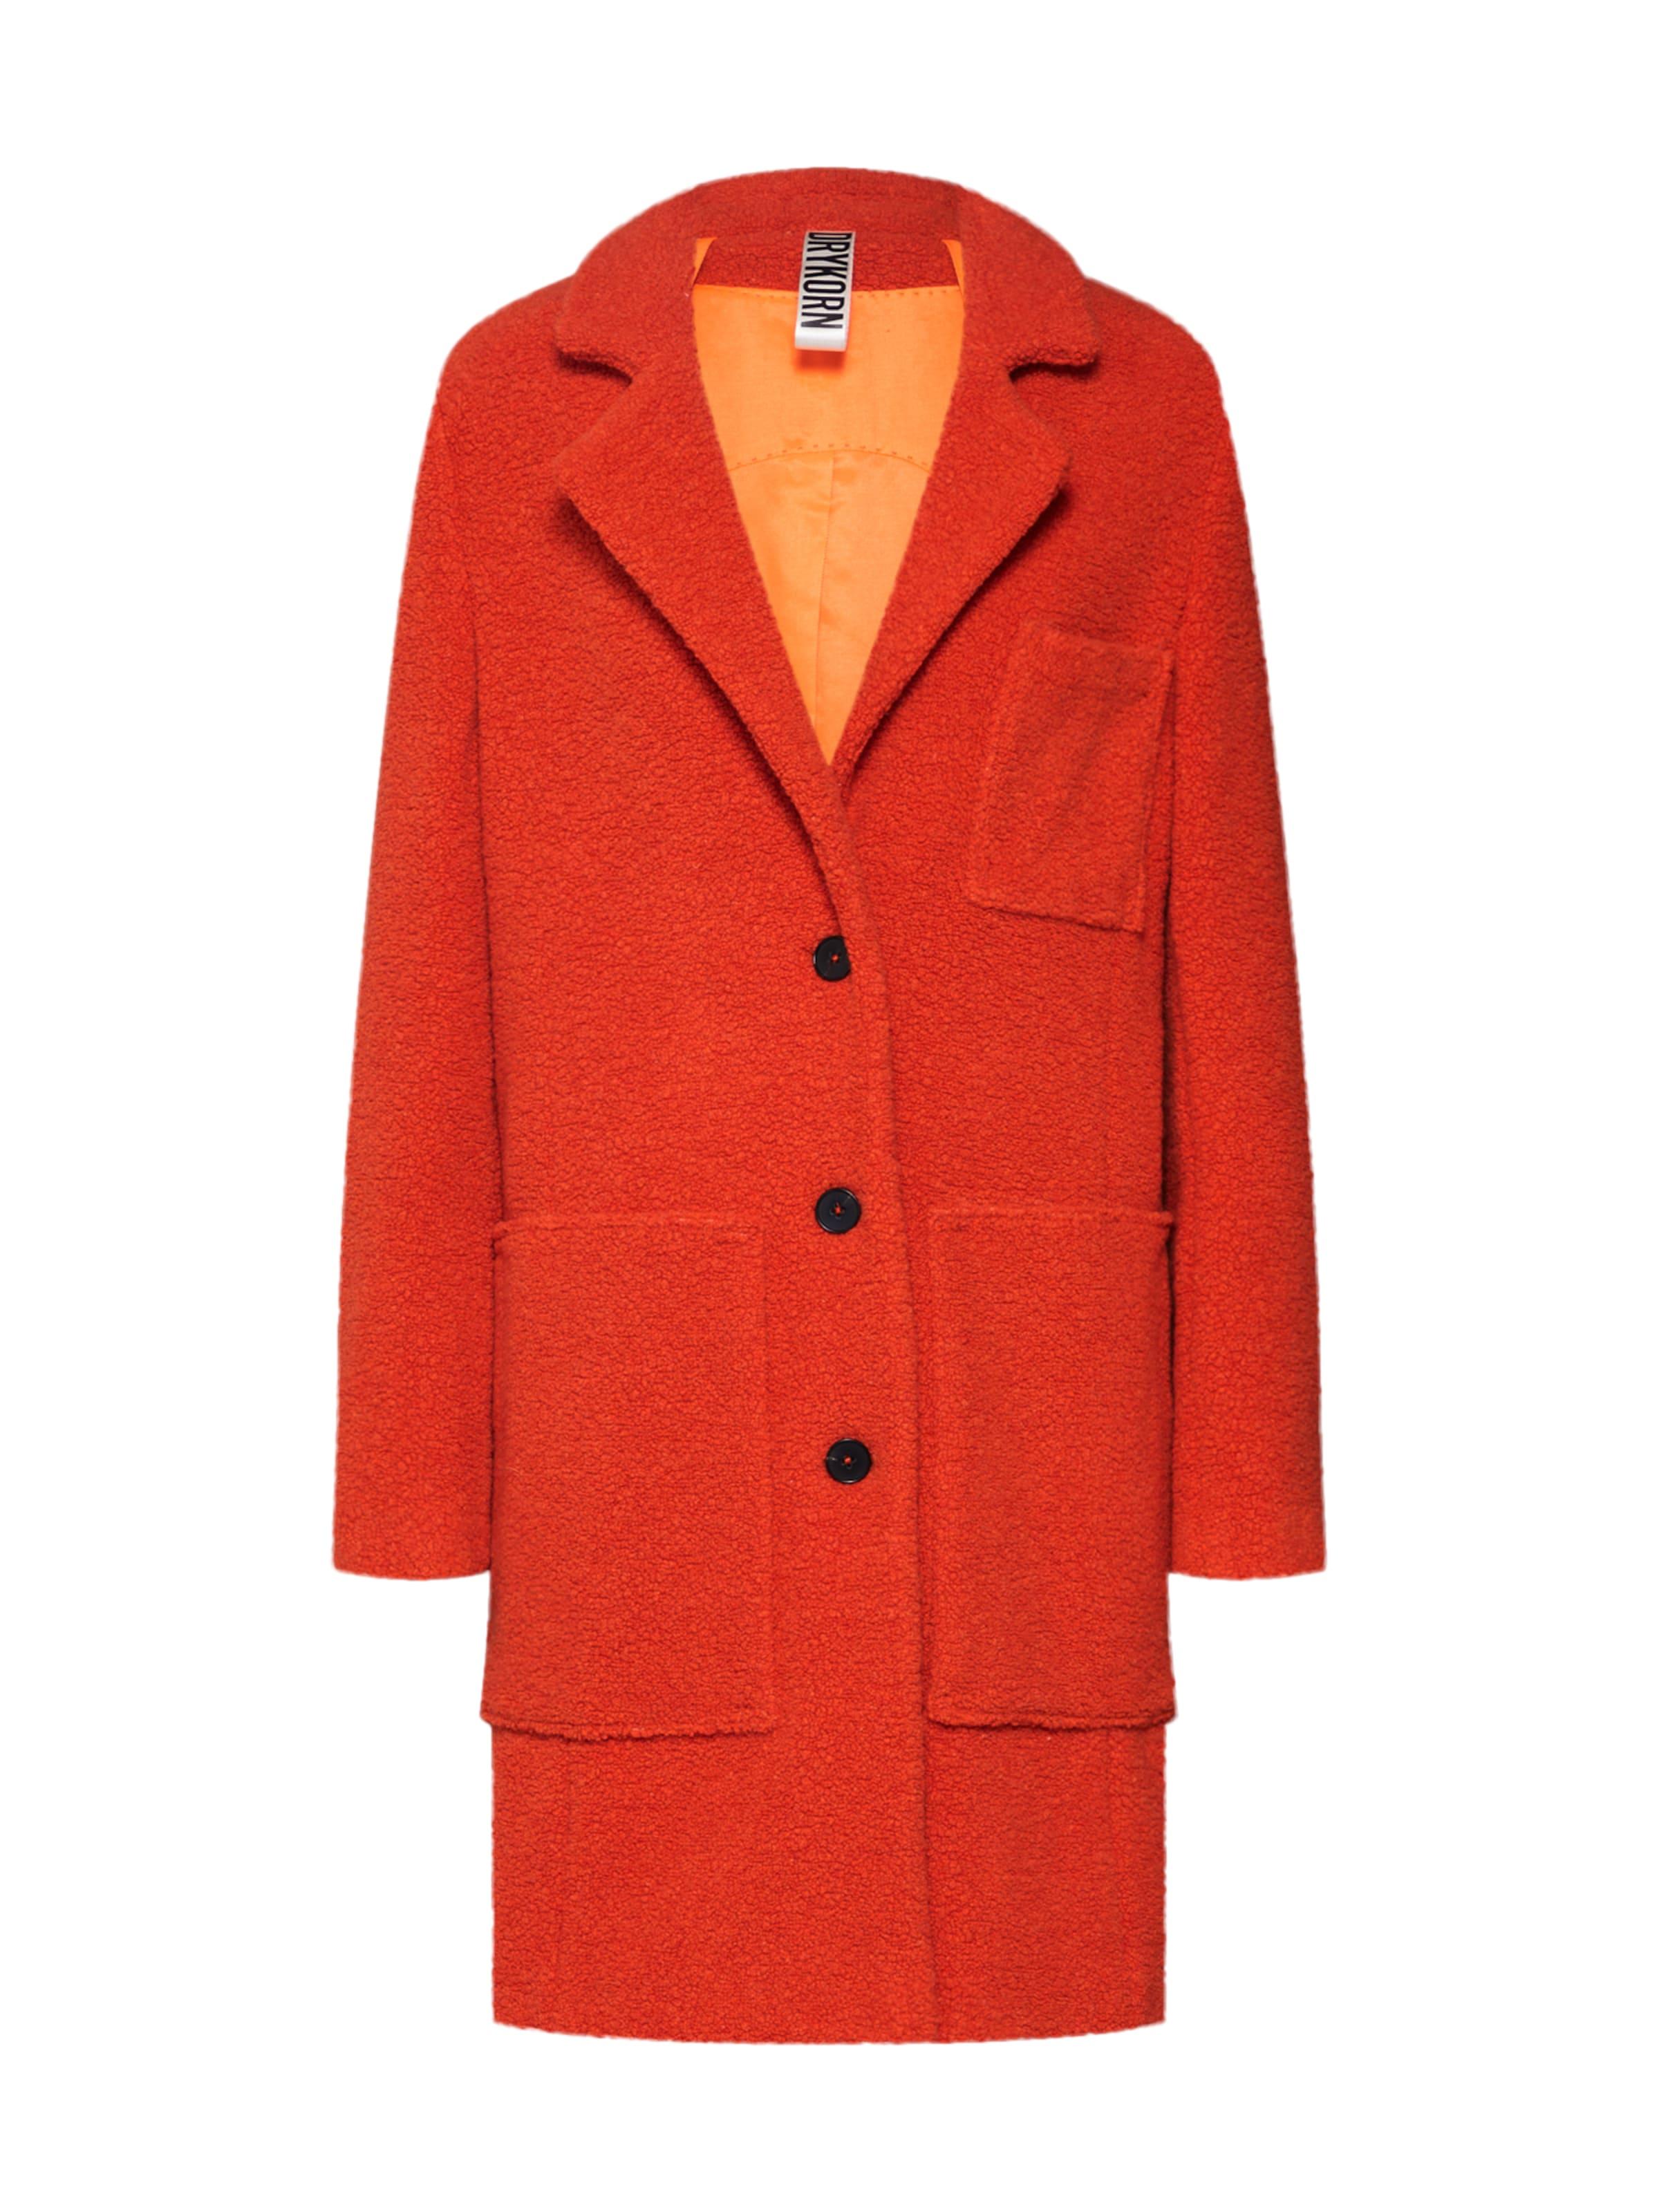 'caslan' Orangerot Mantel In Mantel Drykorn Drykorn Ok0Pwn